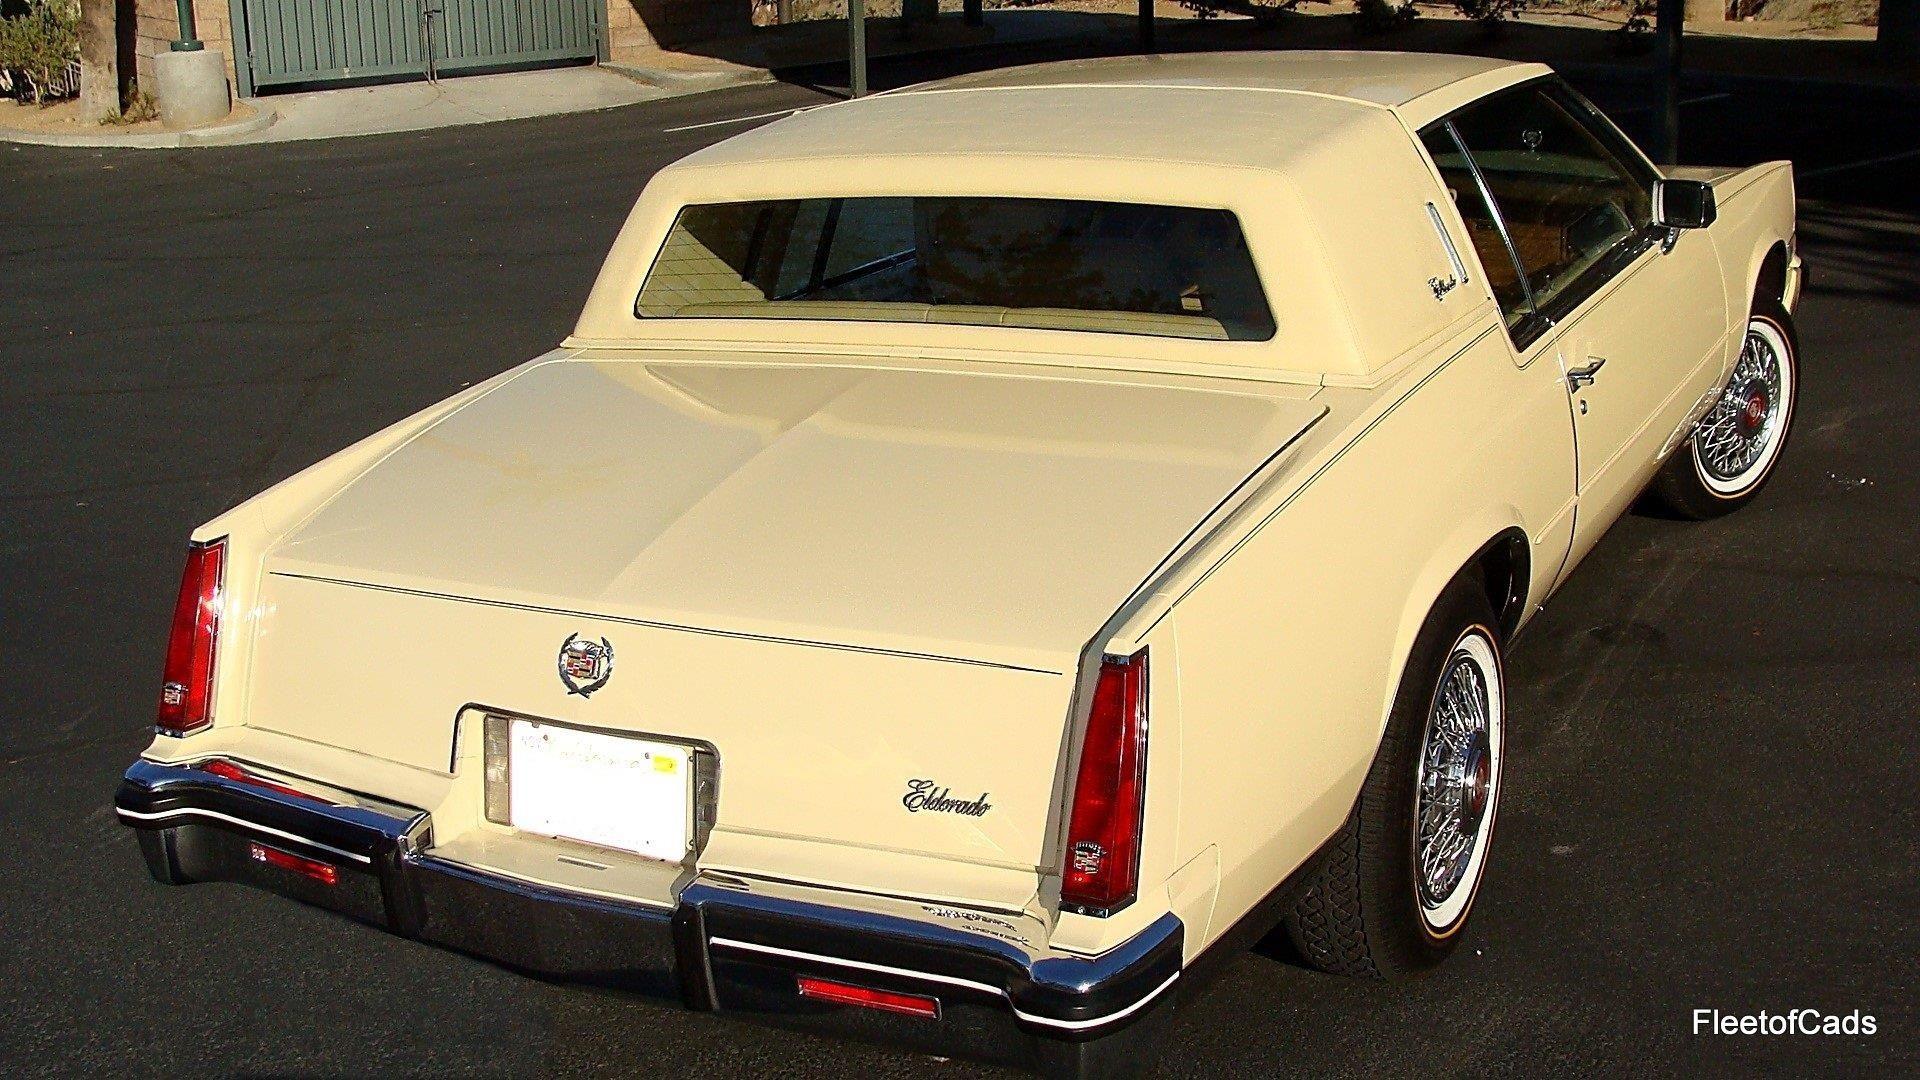 1985 Cadillac Eldorado 26k Miles In Triple Canary Yellow